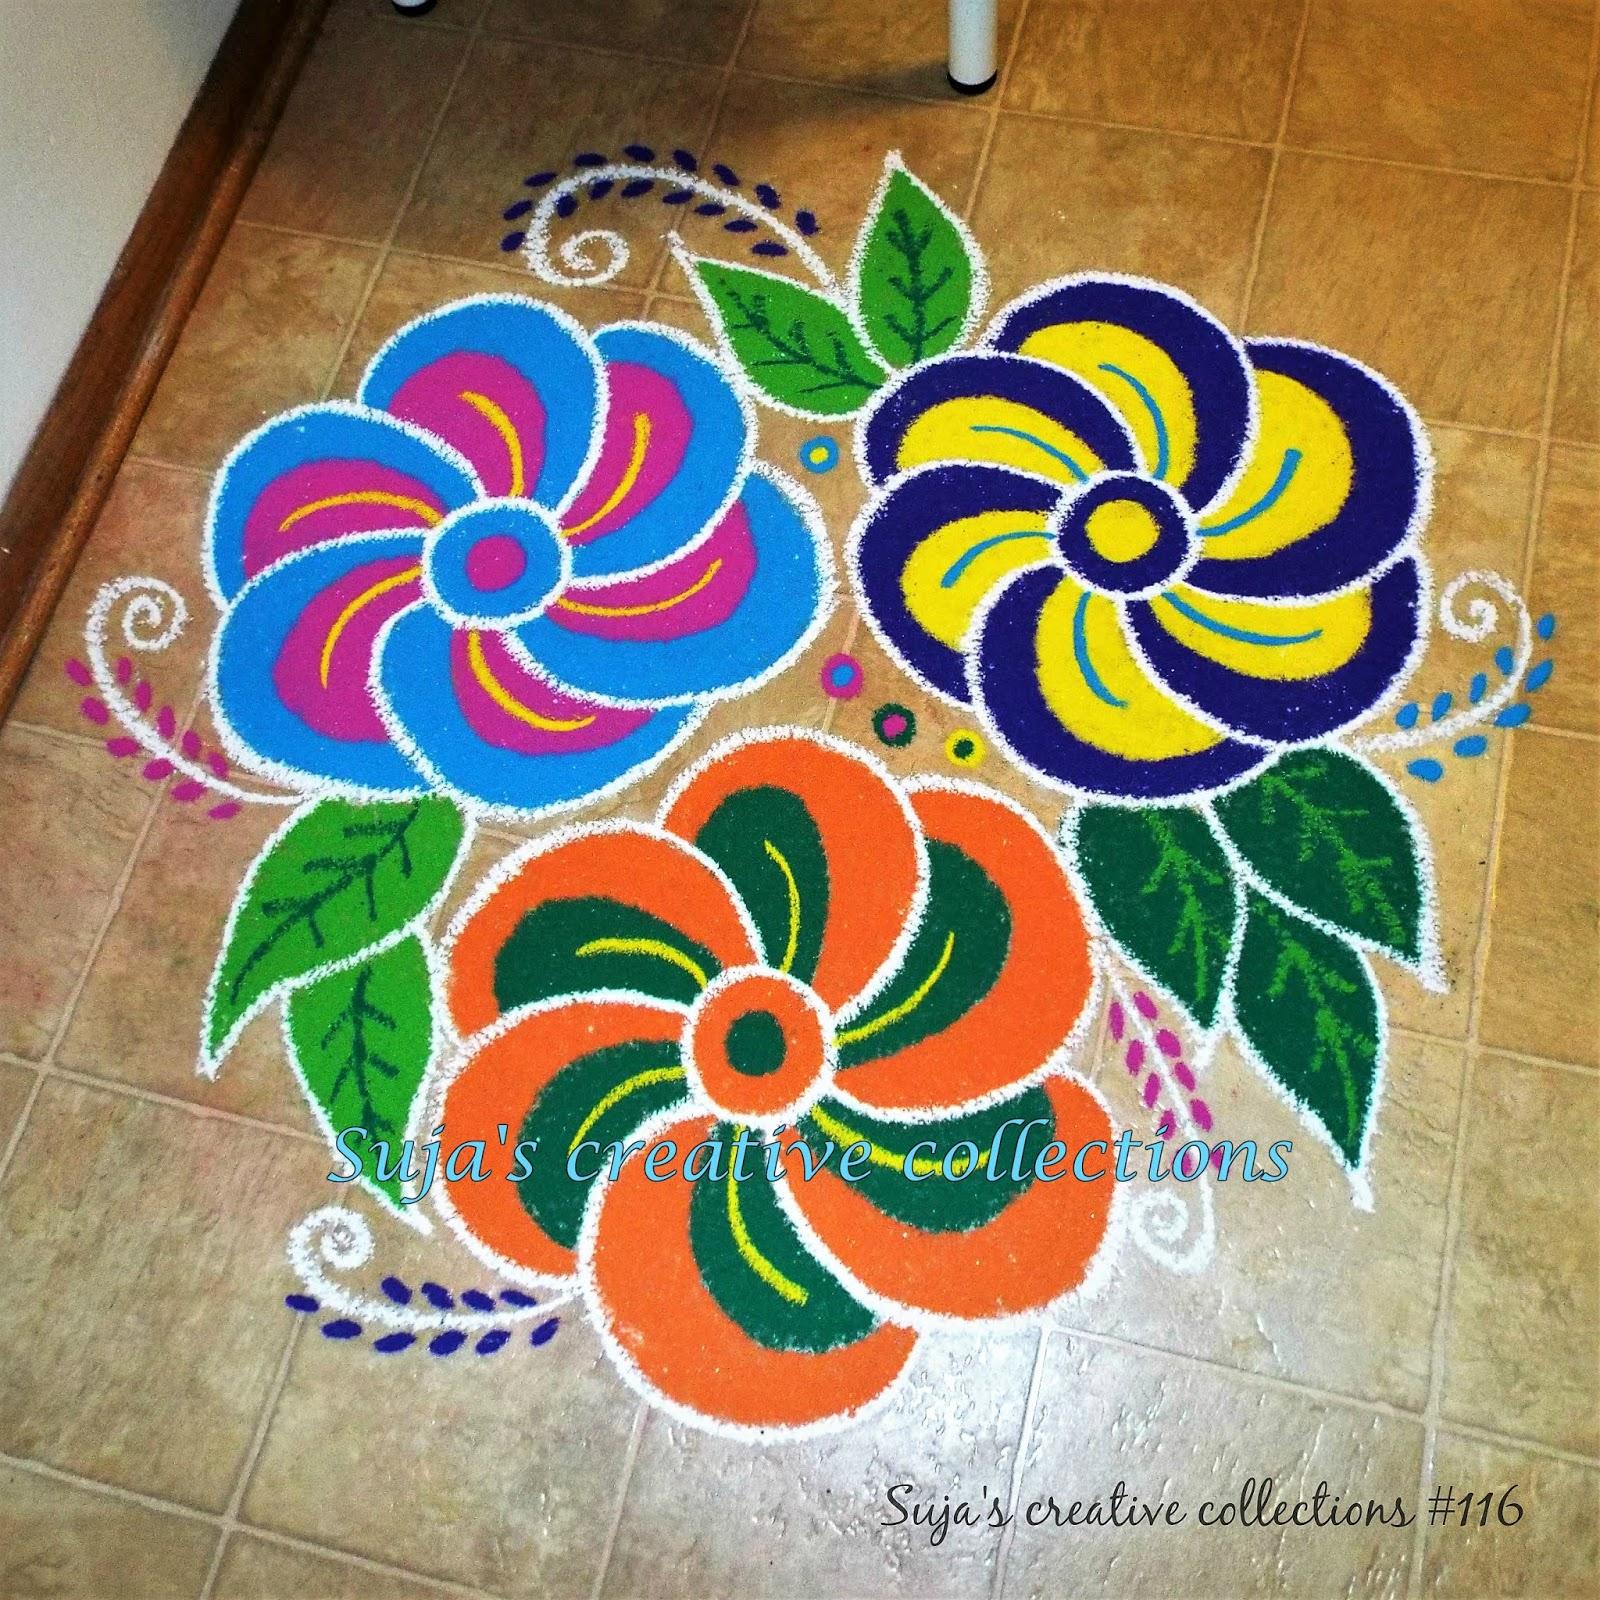 Suja S Creative Collections Floral Rangoli Designs